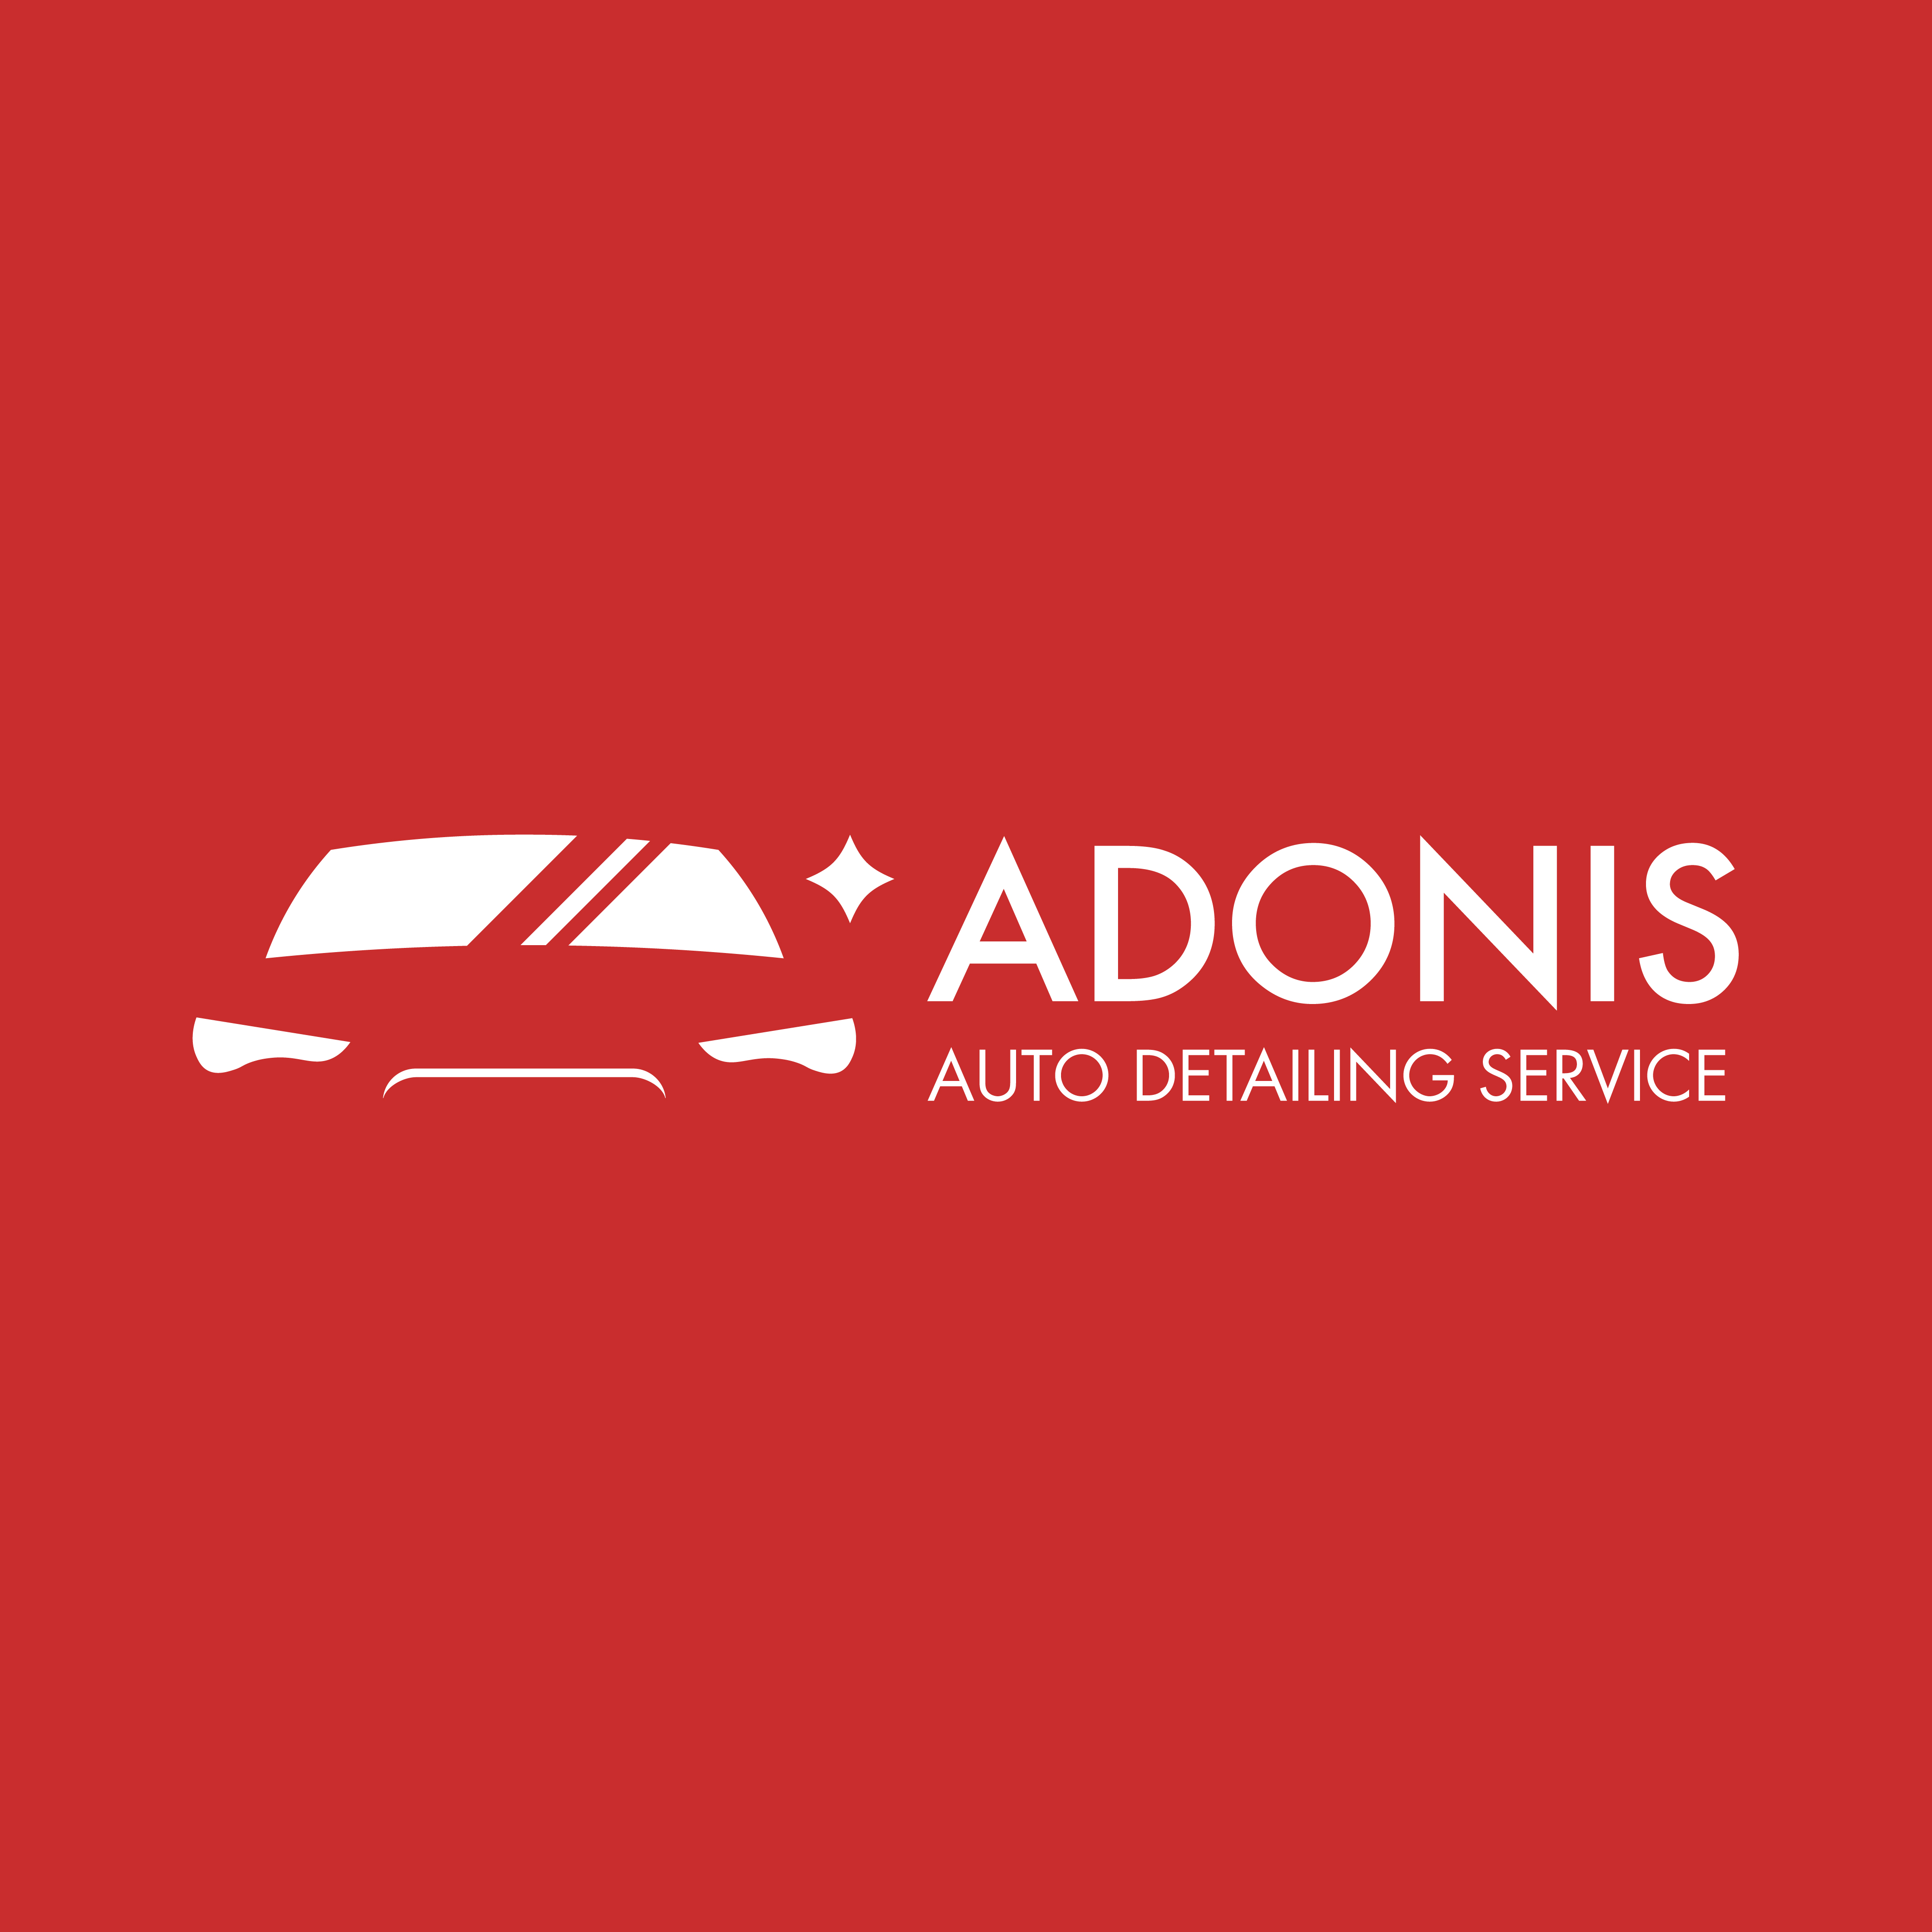 Adonis Auto Detailing logo